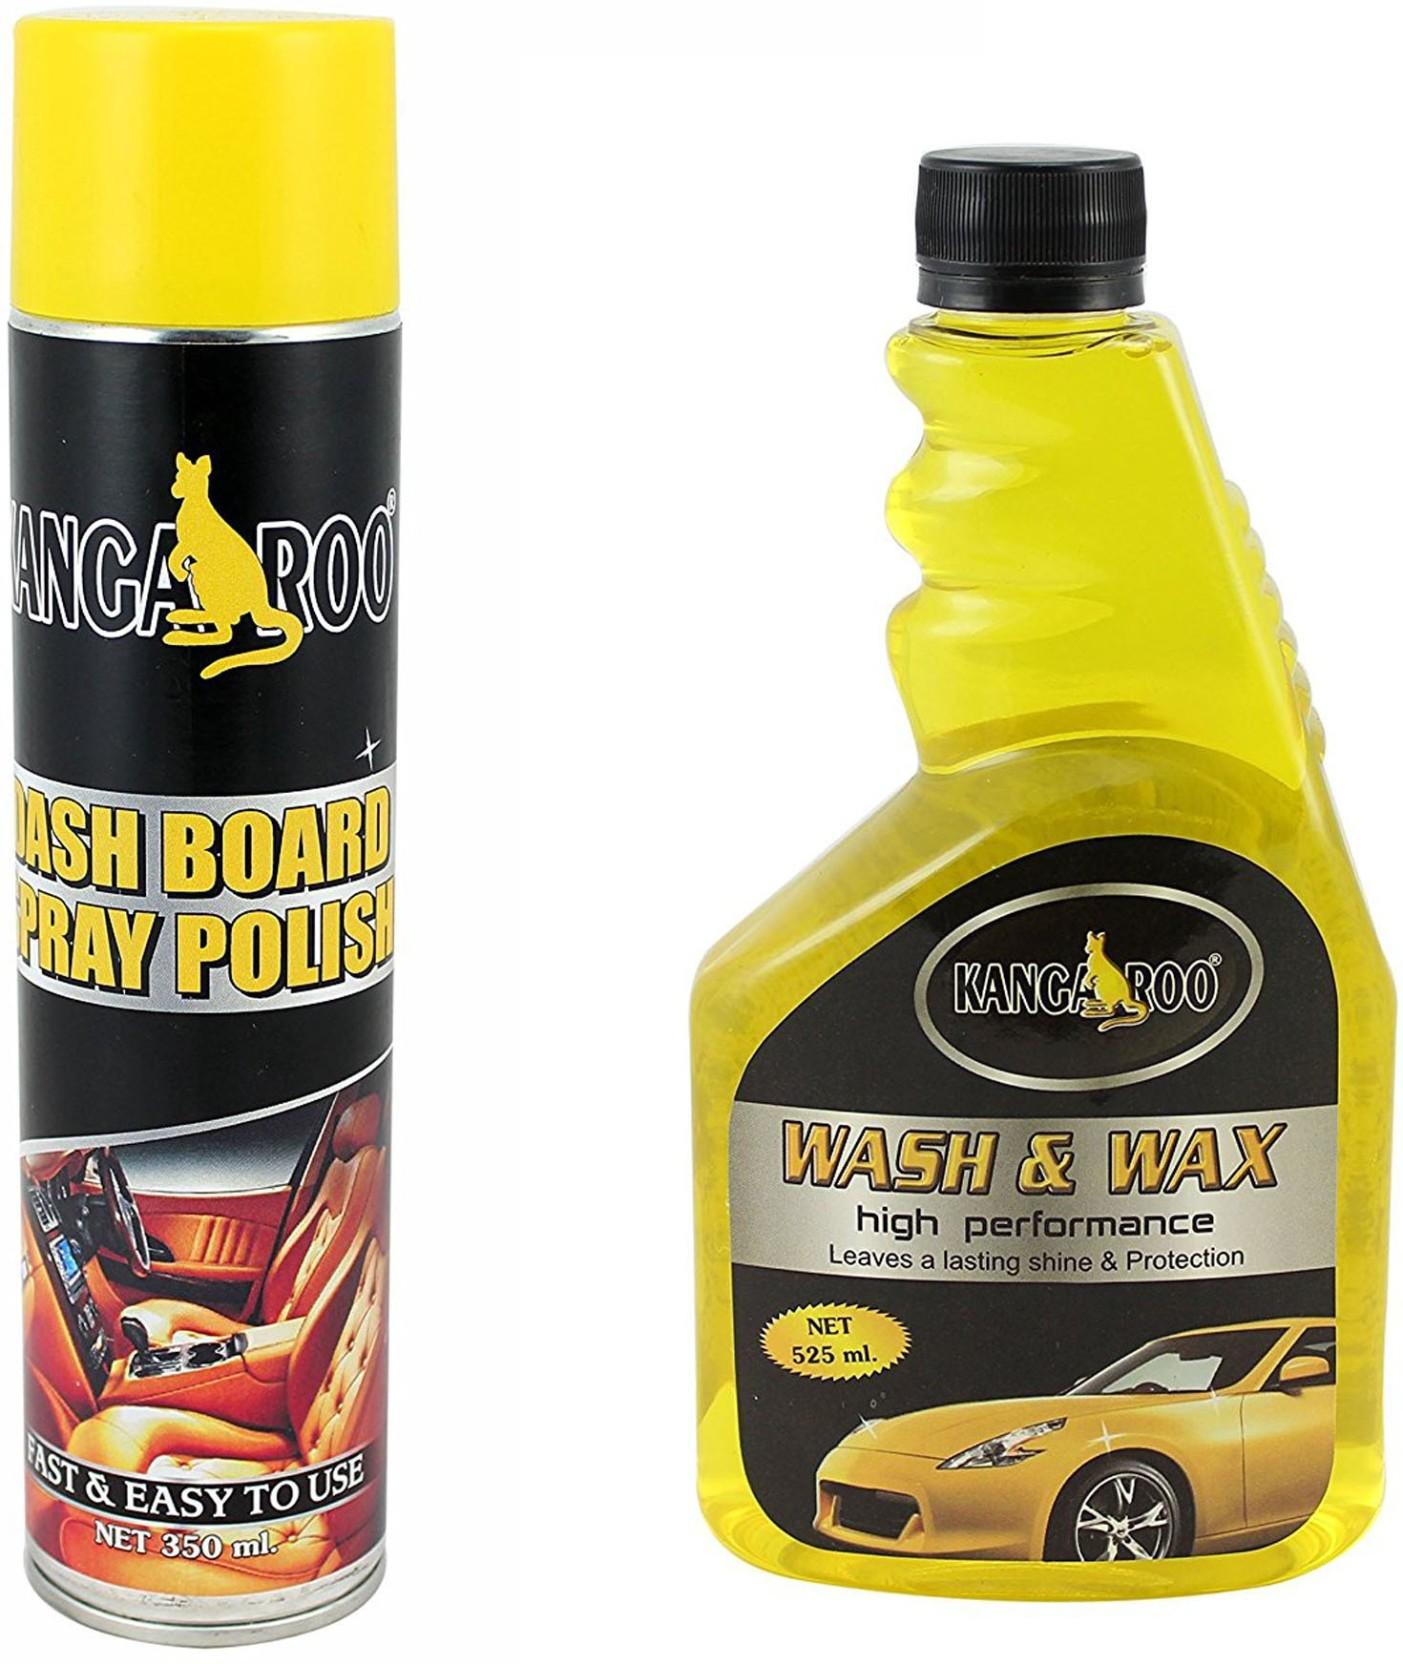 Kangaroo Liquid Car Polish for Dashboard Price in India